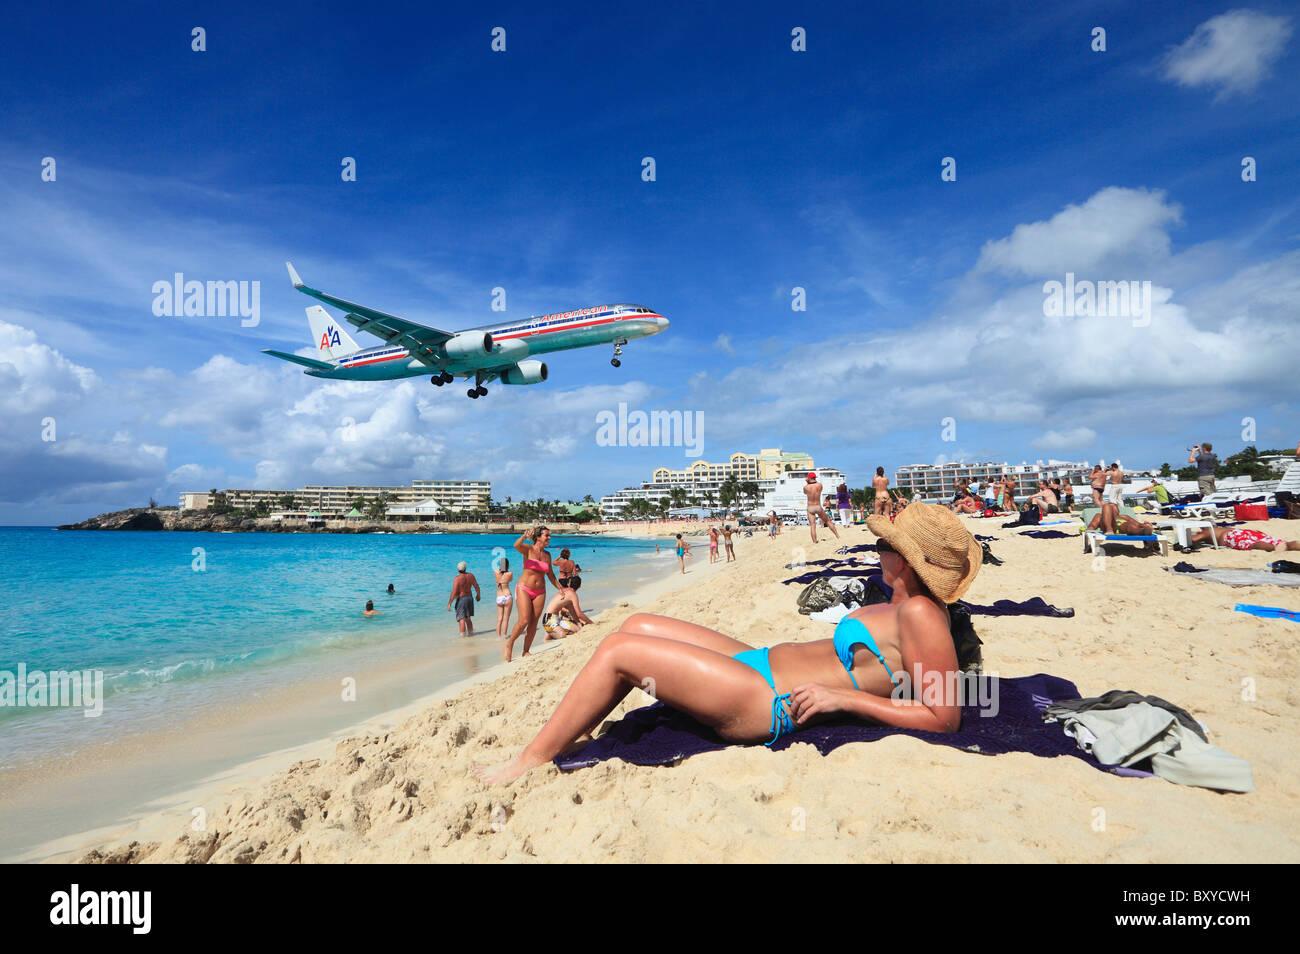 American Airlines Jet landing across the beach at St.Maarten Princess Juliana Airport - Stock Image